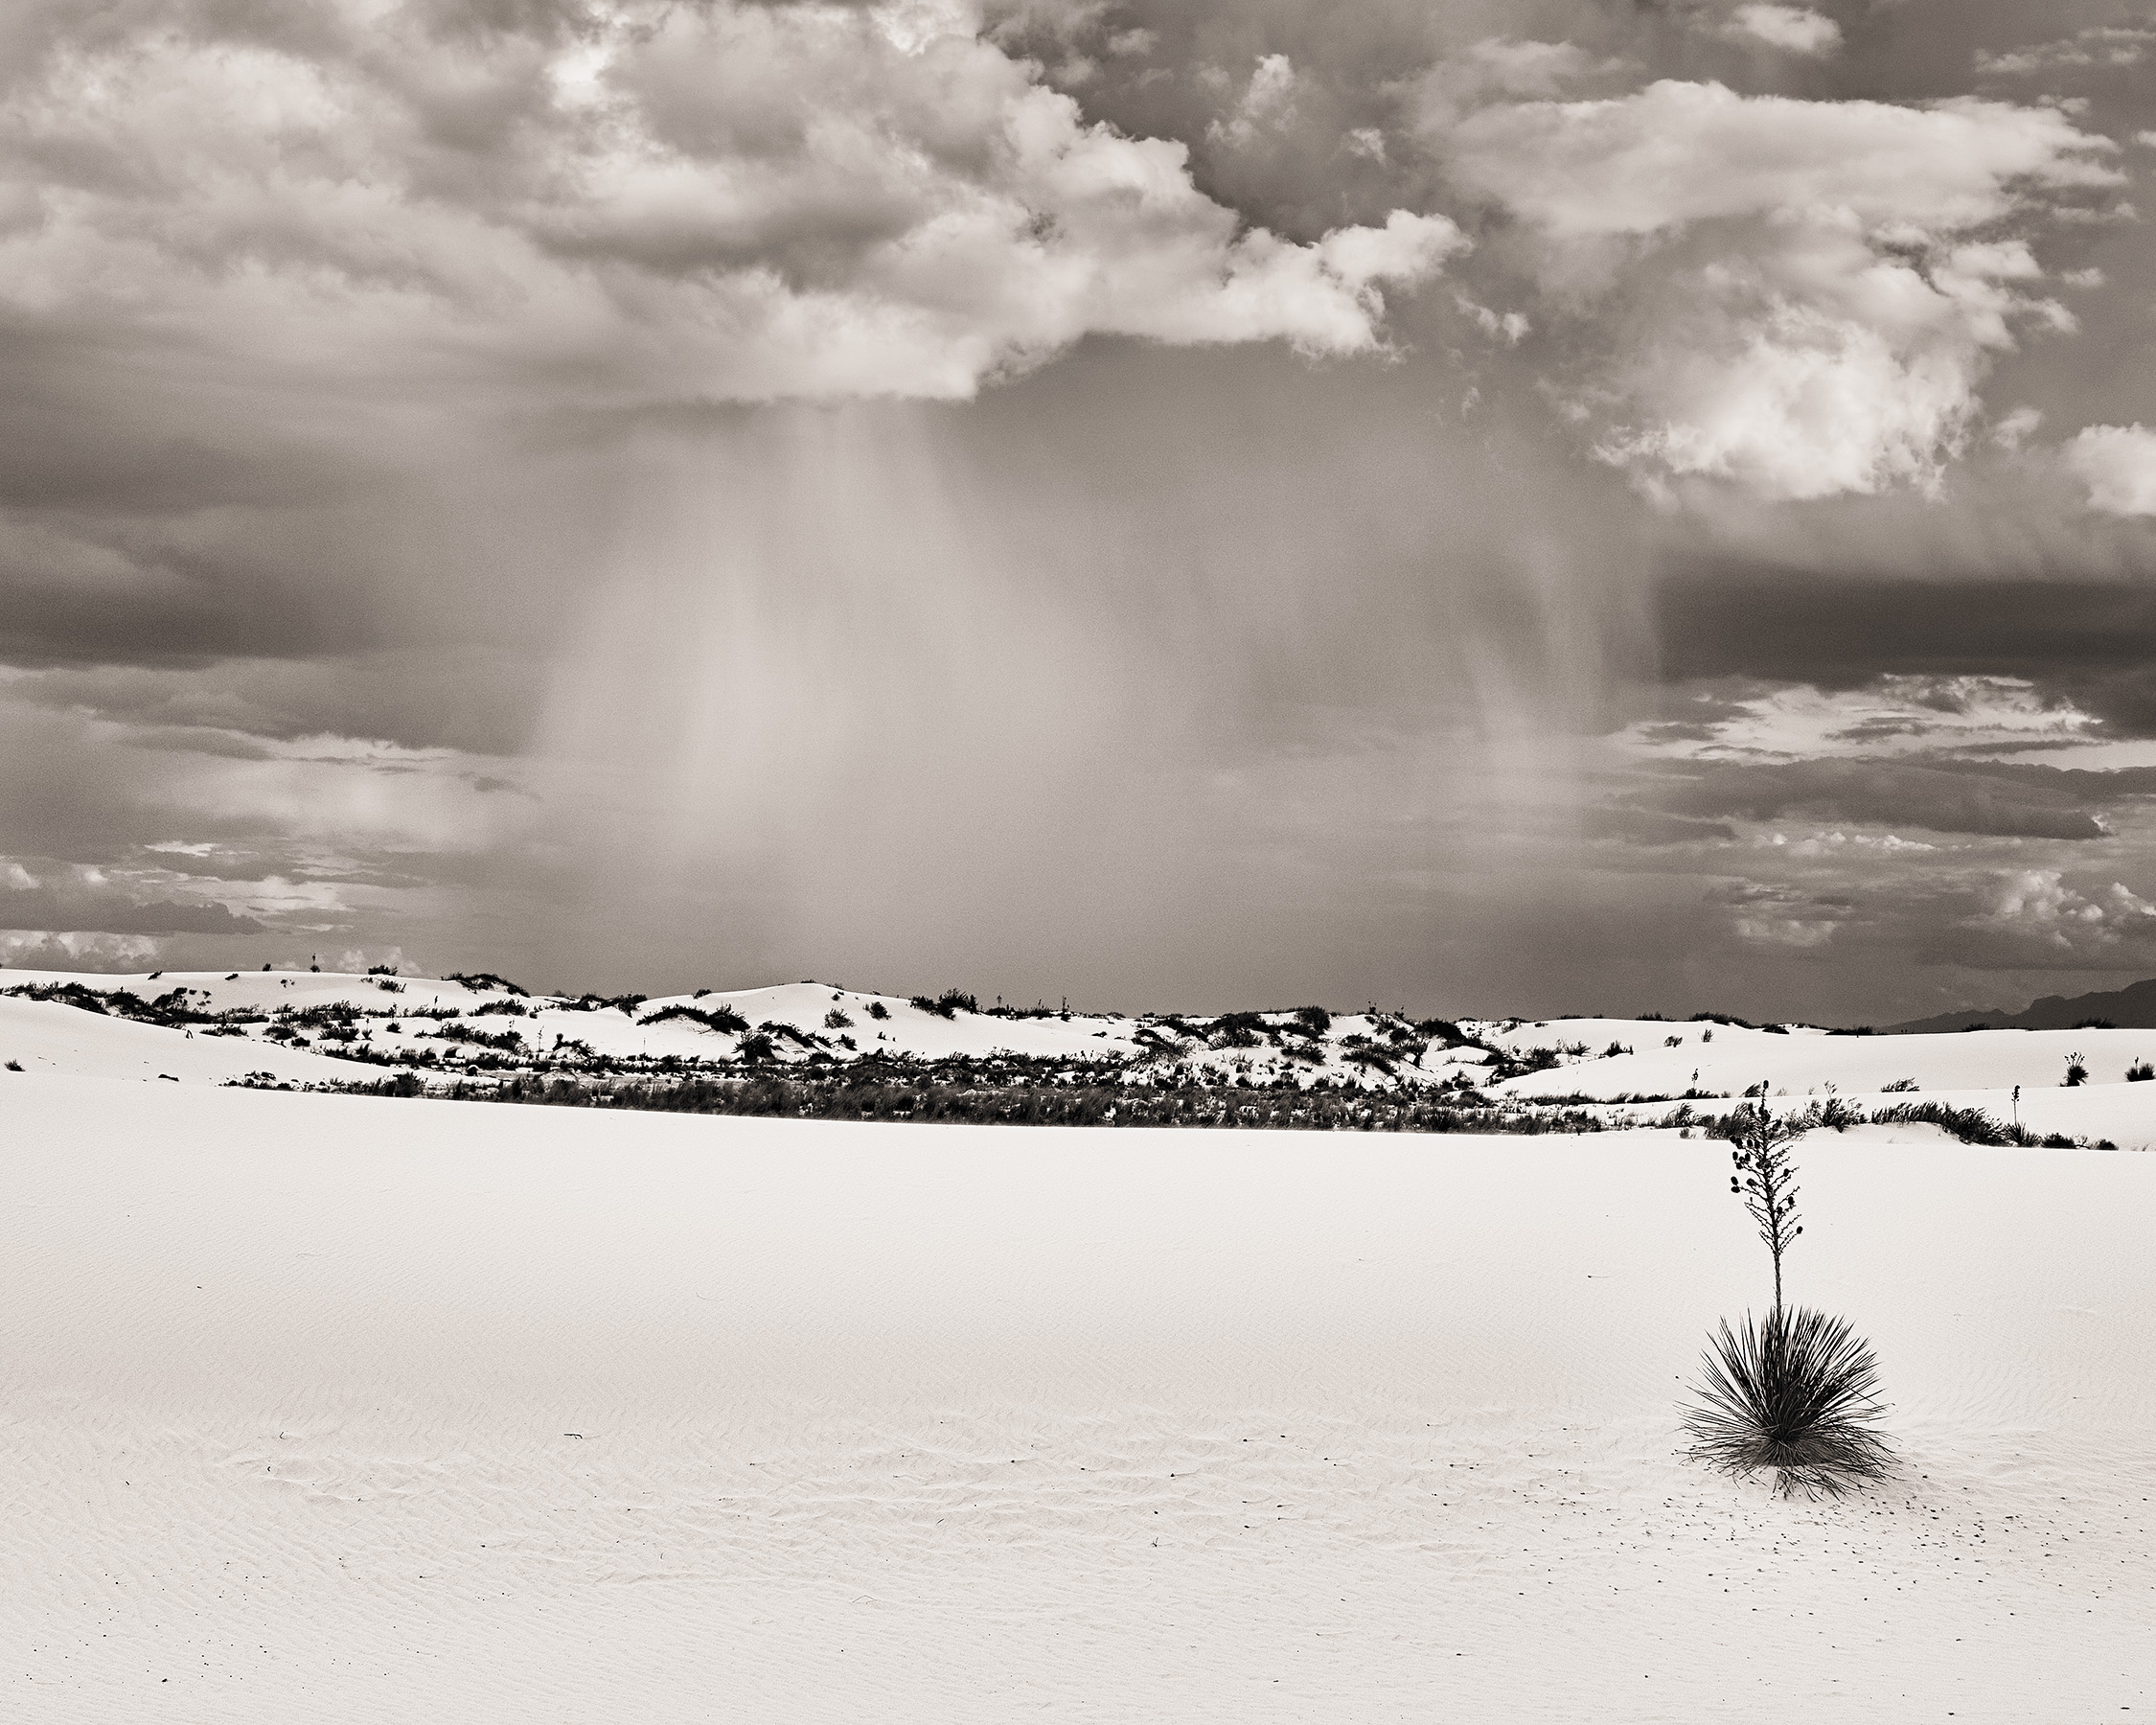 White Sands National Monument, 2015